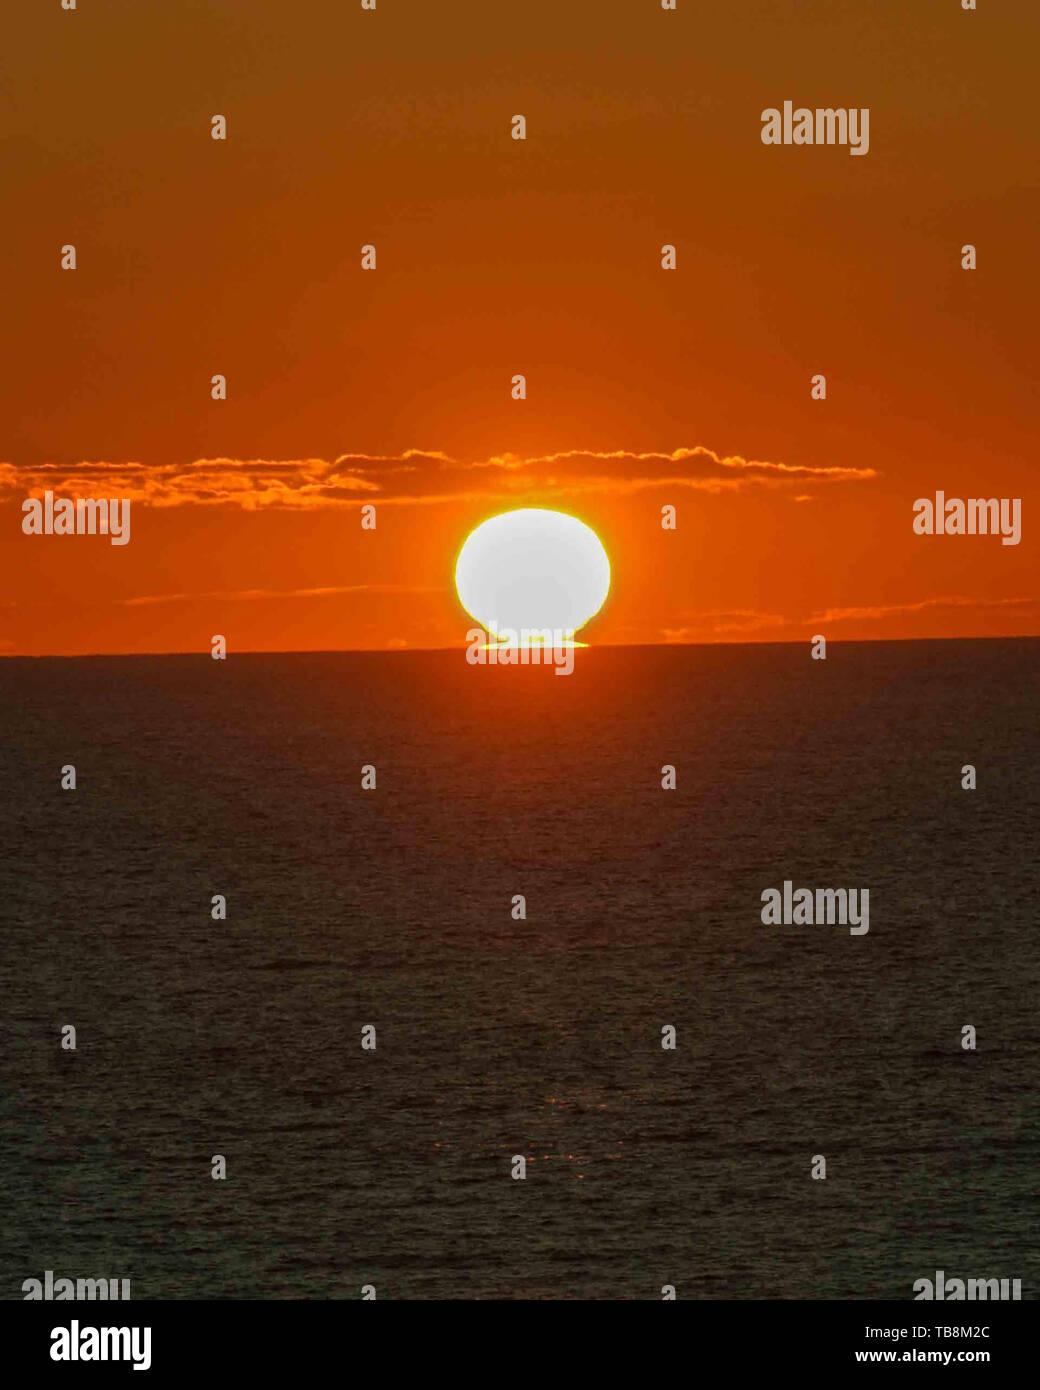 Halifax, Nova Scotia, Canada. 5th Sep, 2005. The sun sets into the Atlantic Ocean off the coast of Nova Scotia near the city of Halifax. Credit: Arnold Drapkin/ZUMA Wire/Alamy Live News - Stock Image